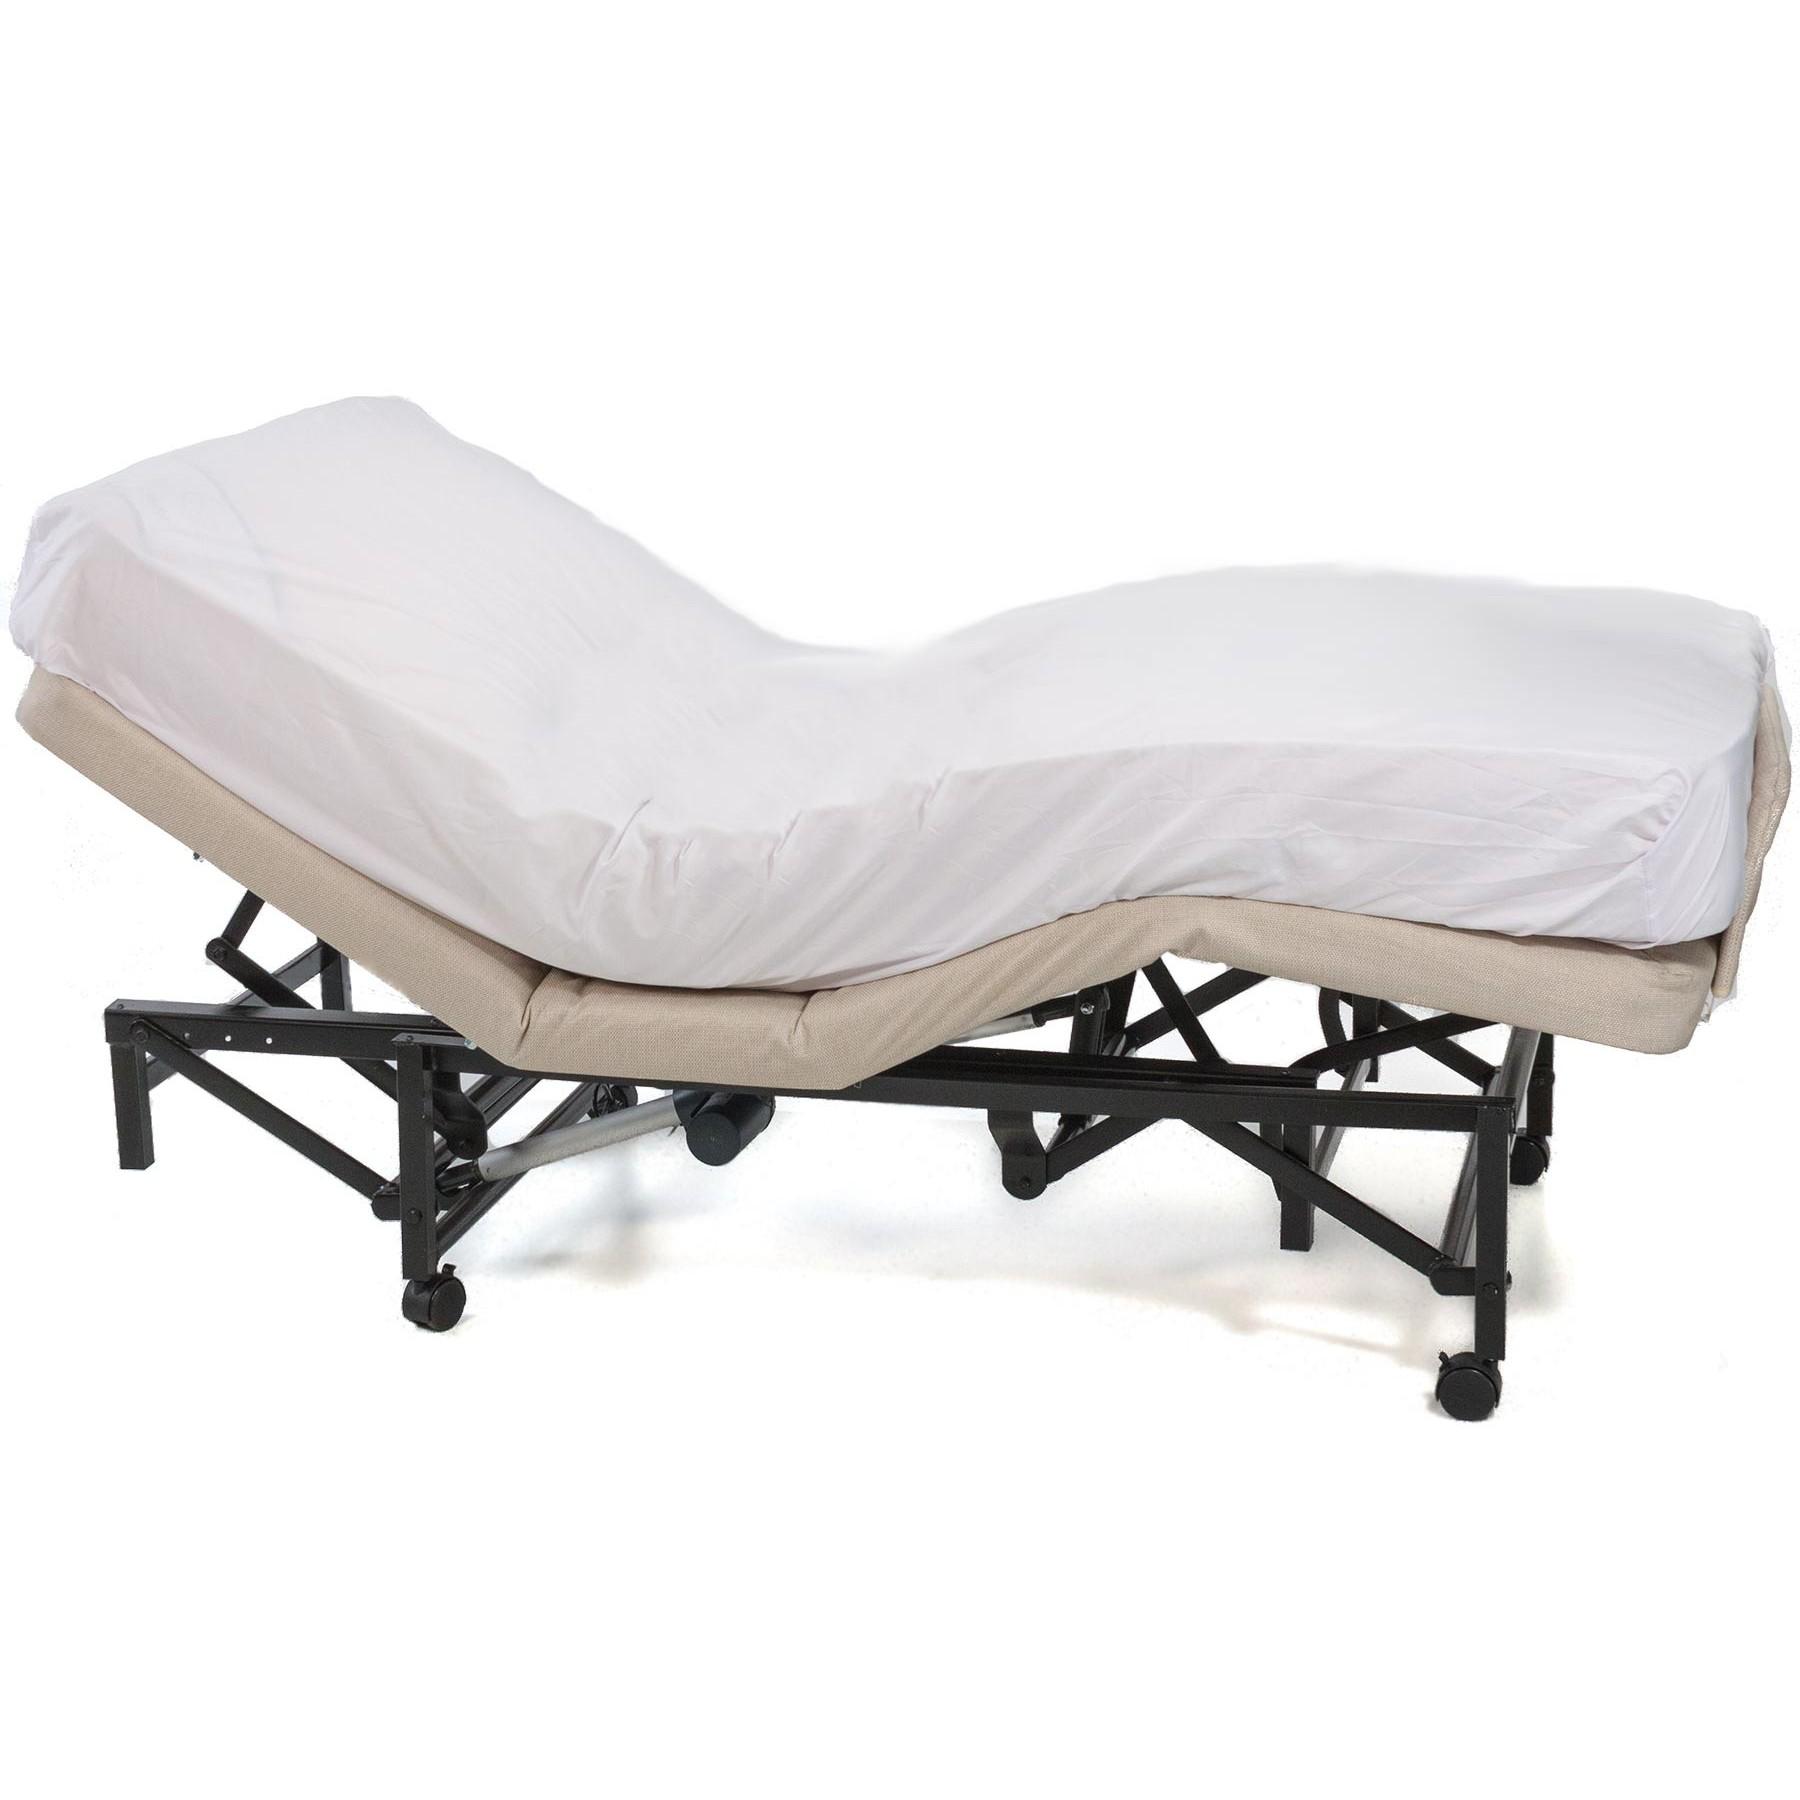 Side view of Flex-a-Bed 185 Hi-Low Adjustable Bed